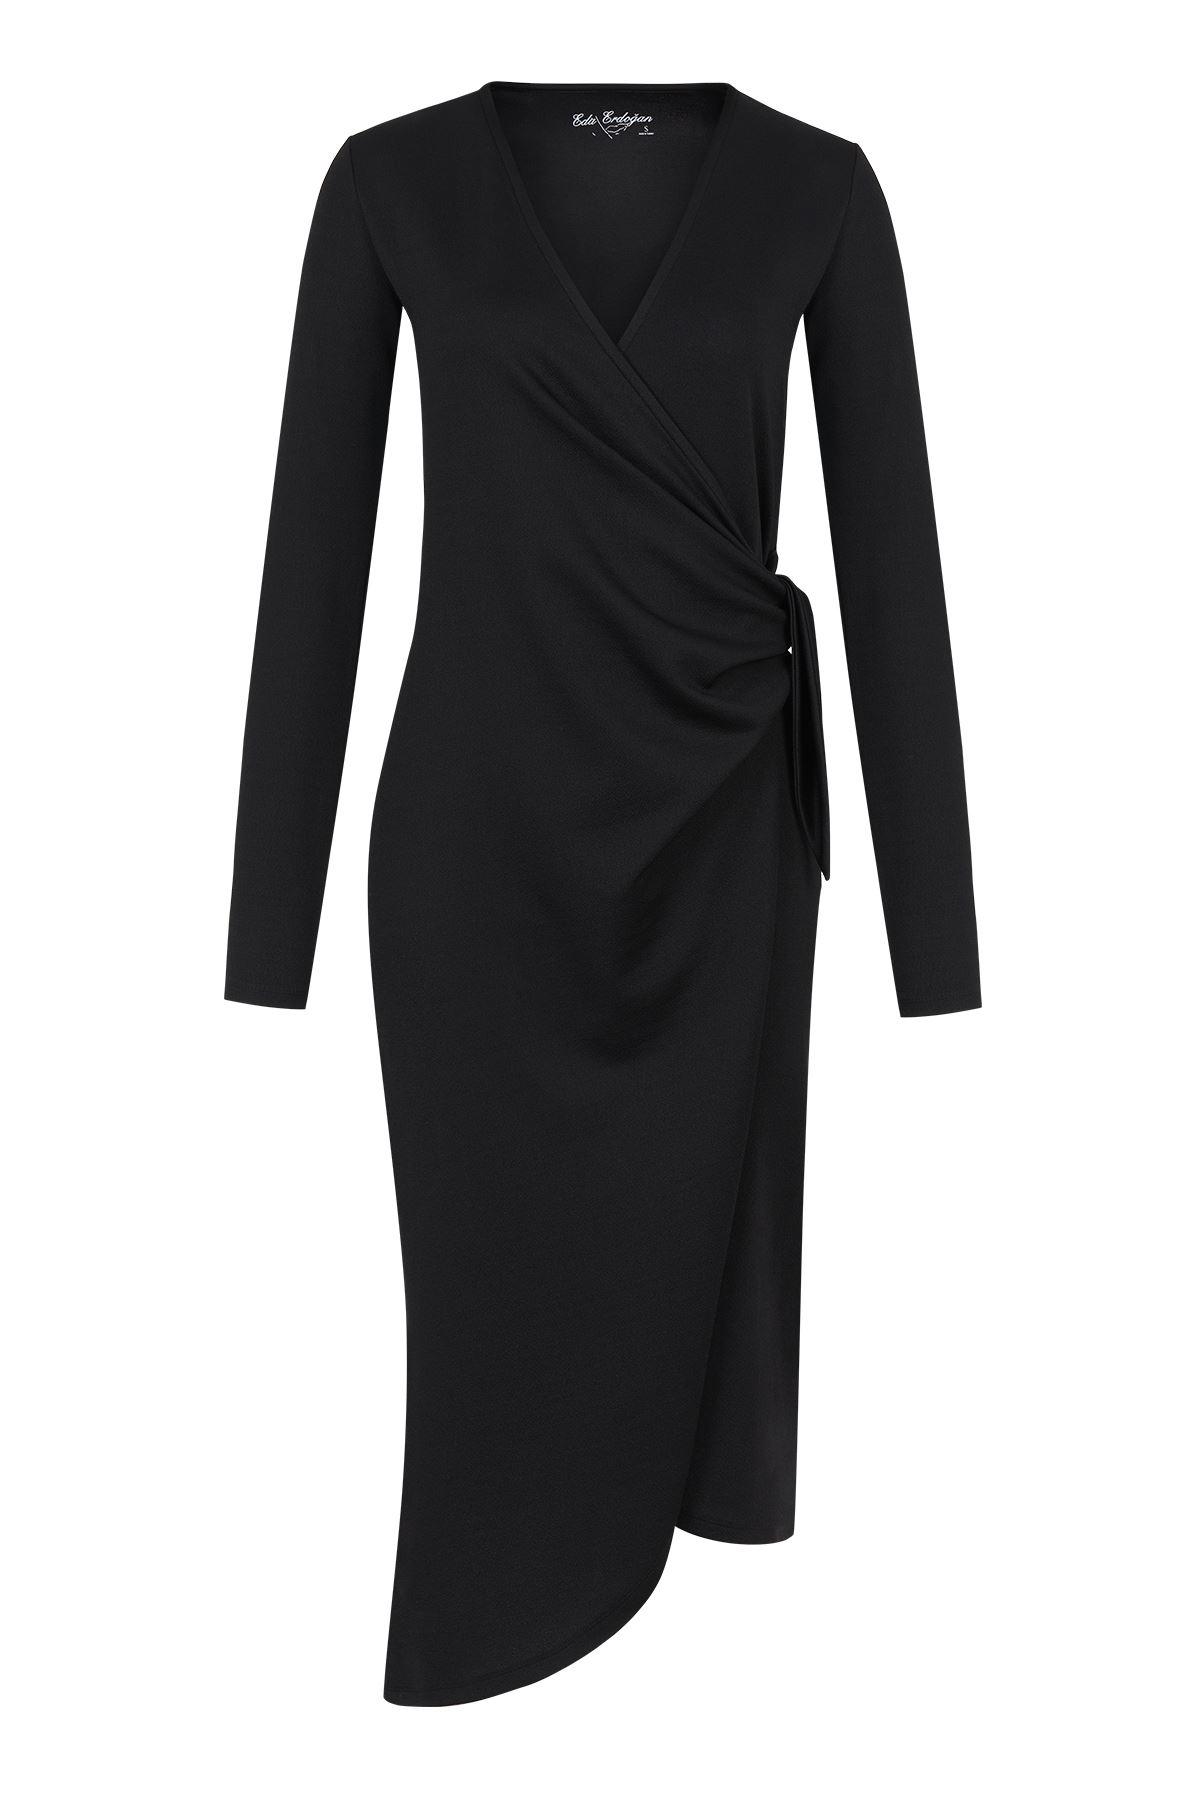 Siyah Kruvaze Midi Boy Elbise